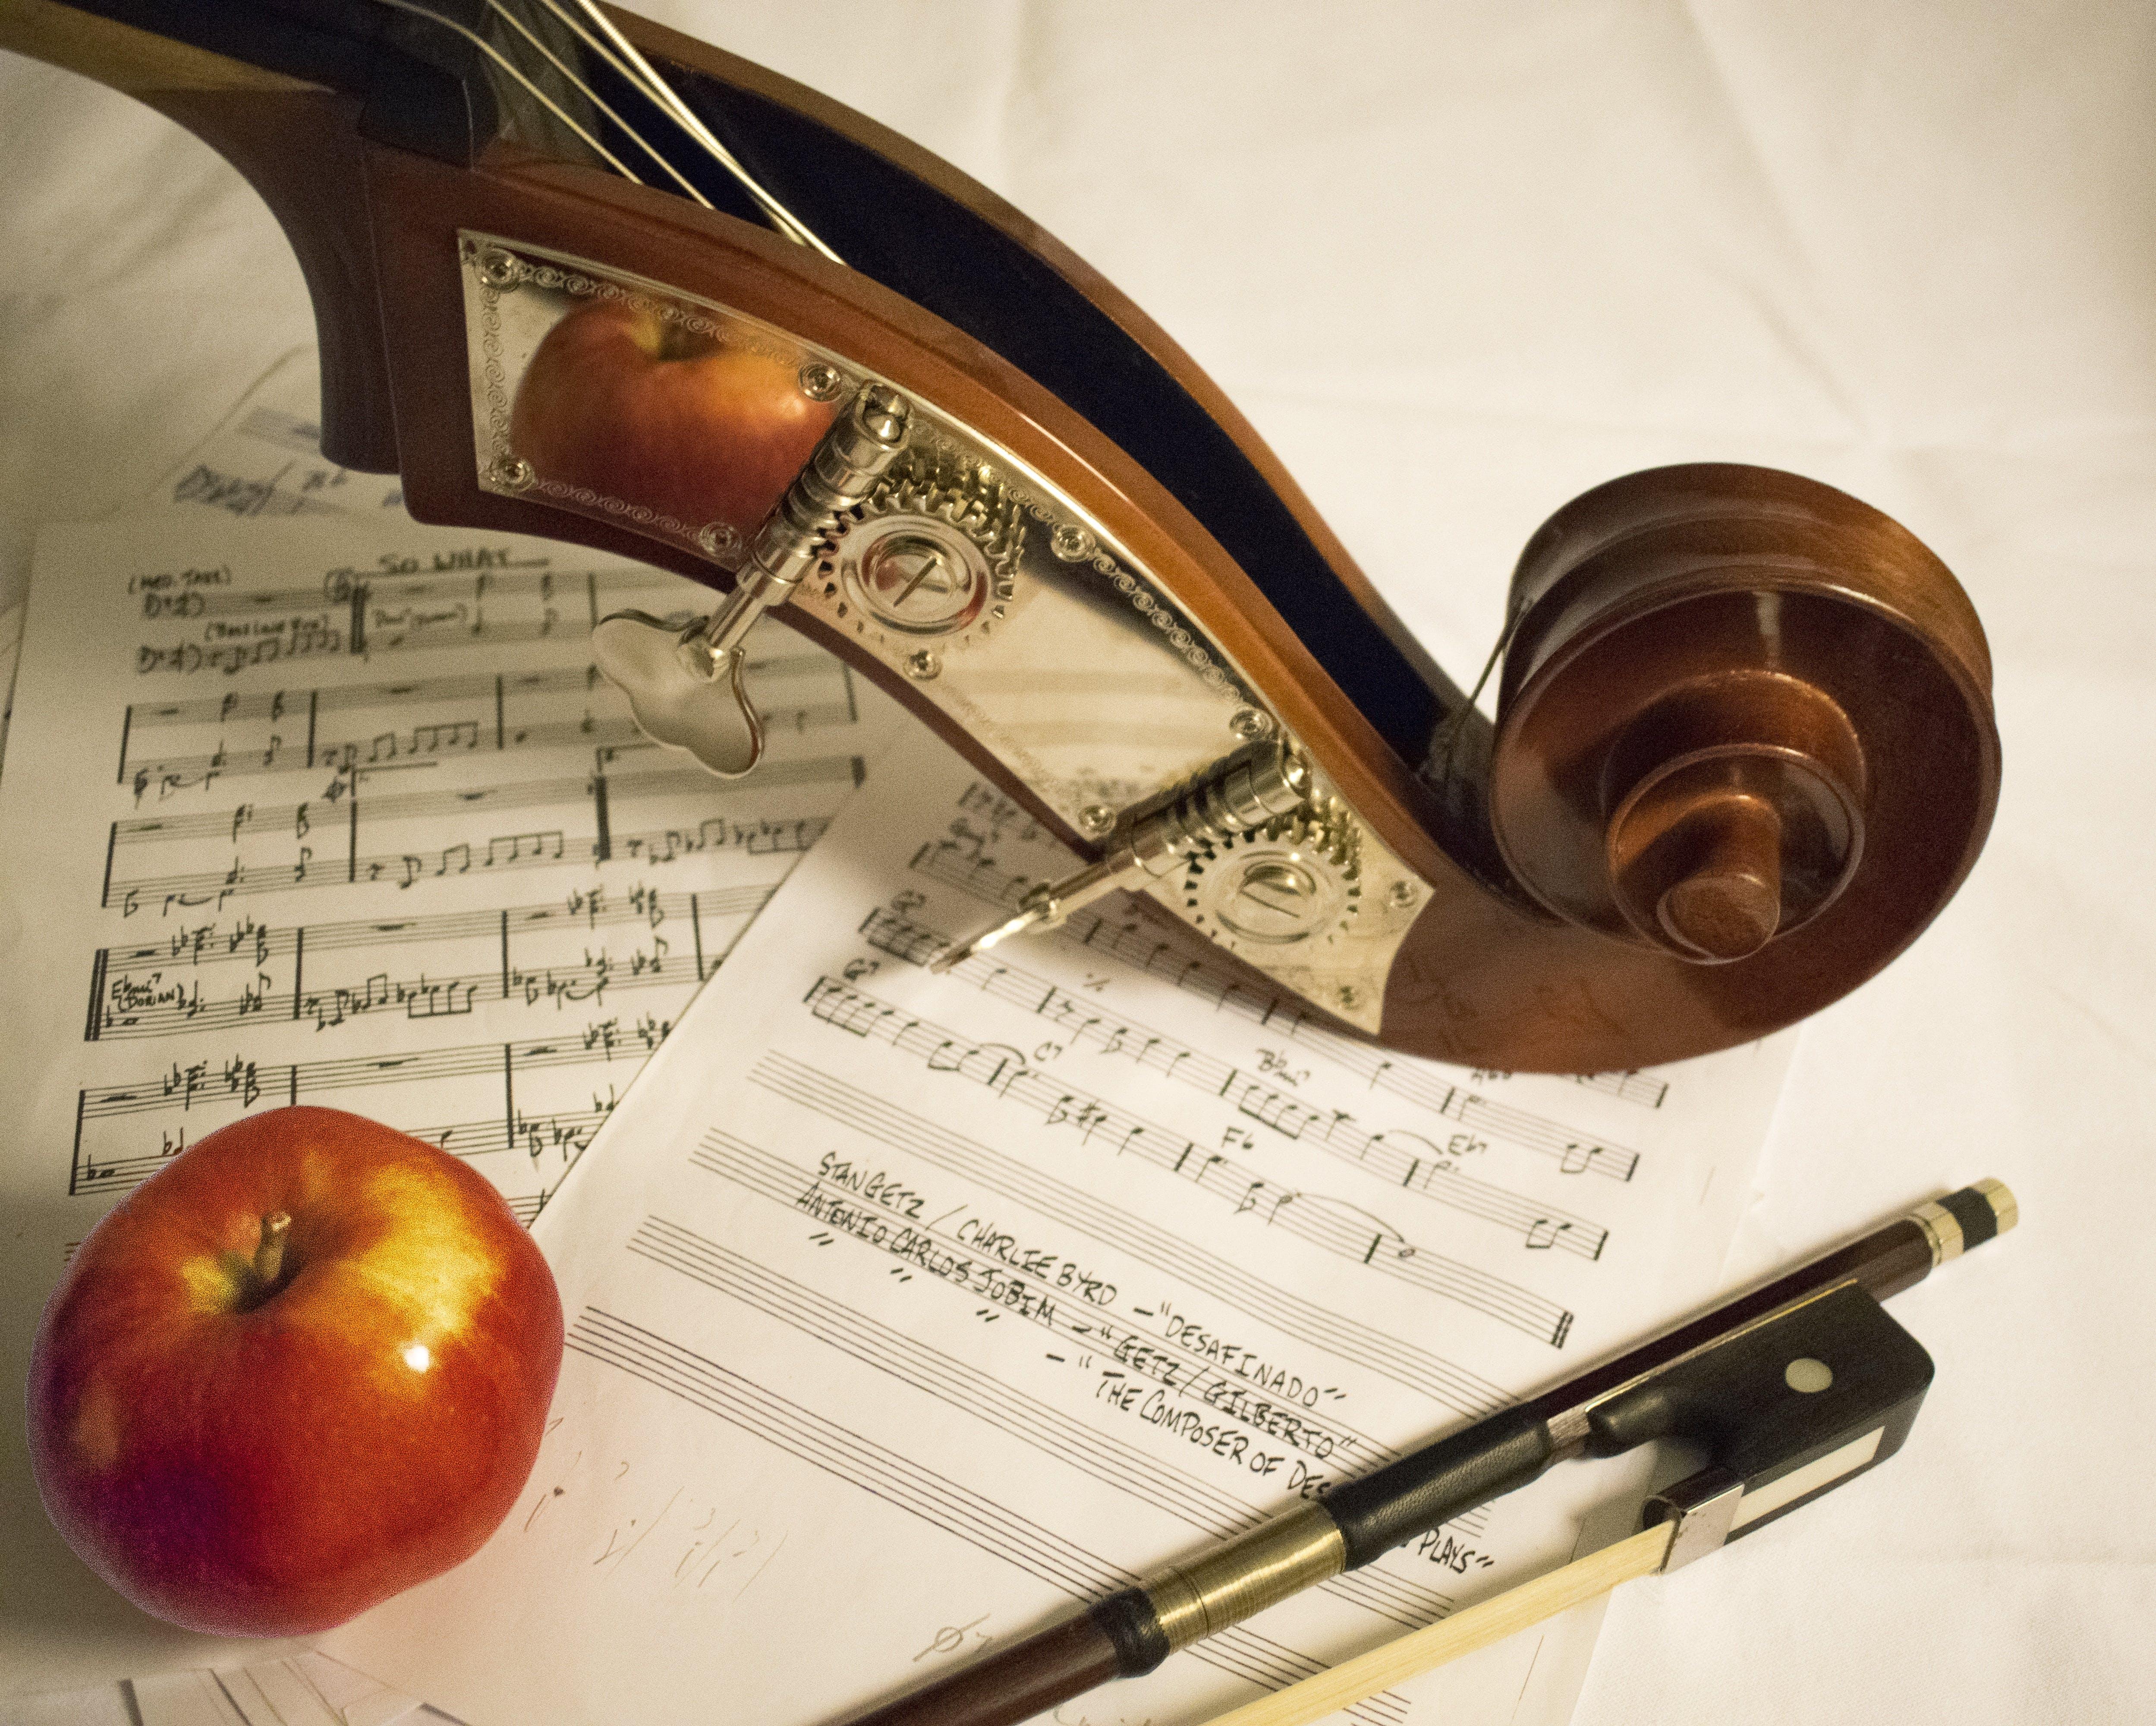 Red Apple Fruit on Music Sheet